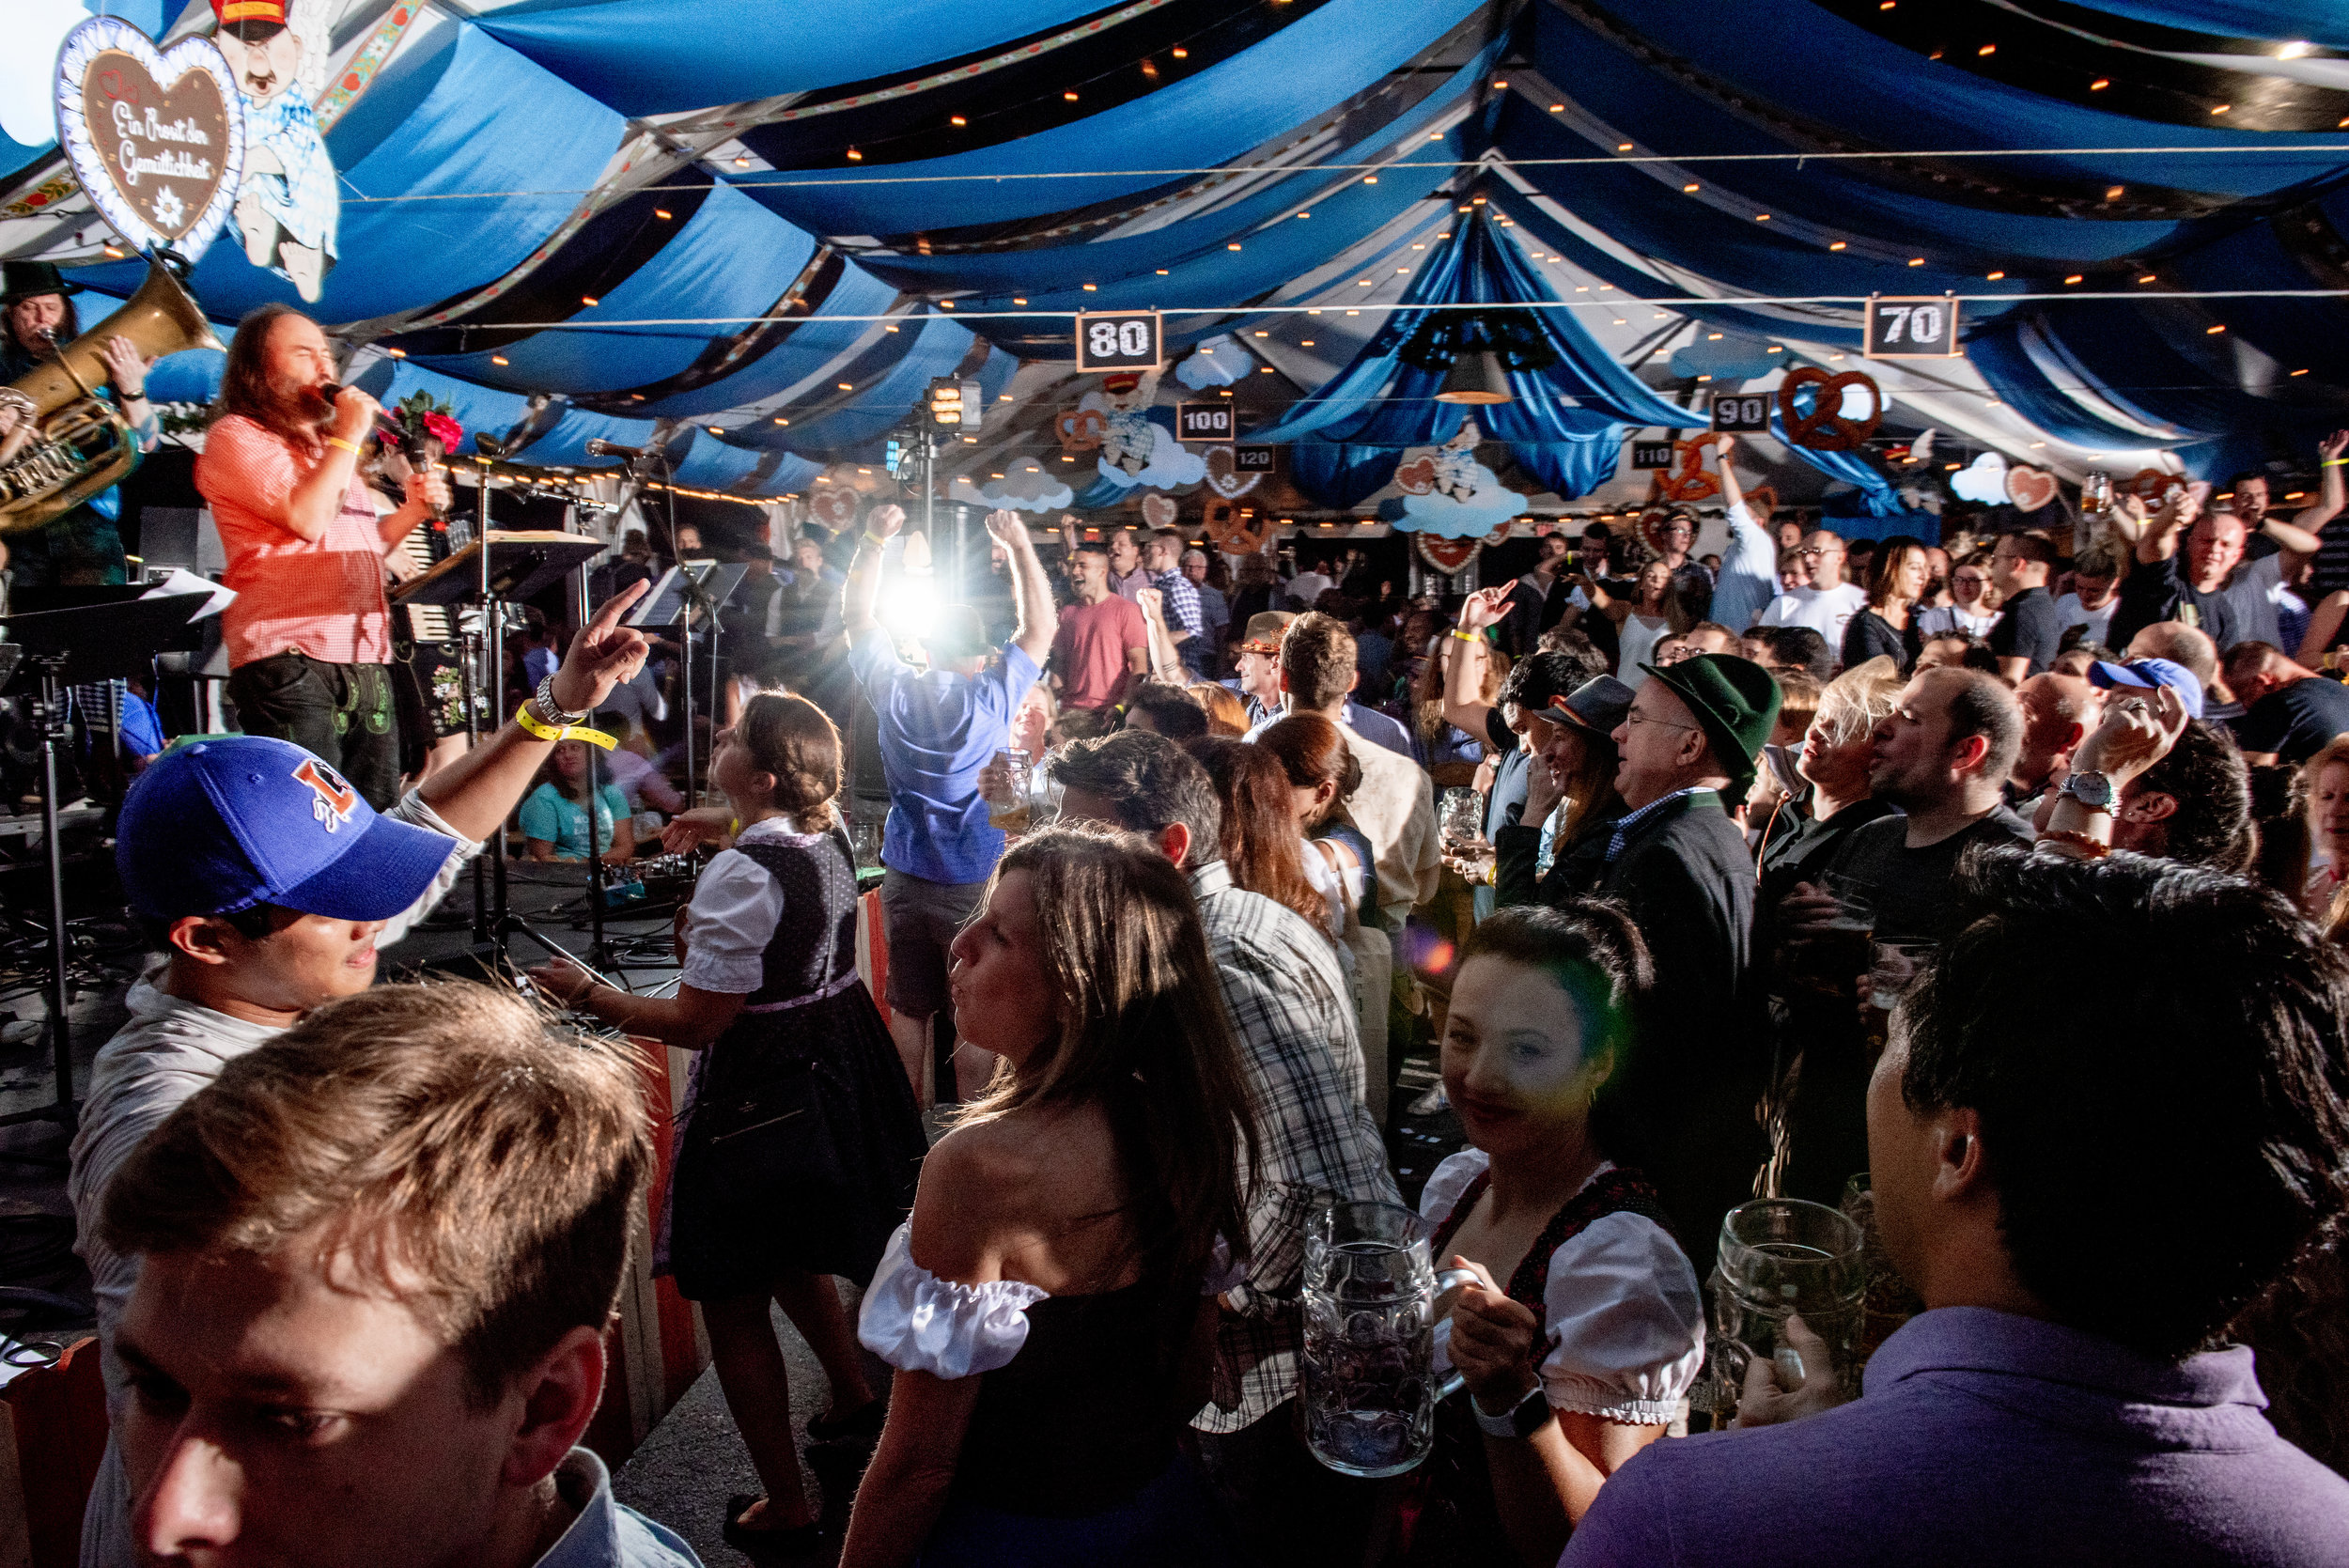 jonathan-mcphail-photography-brooklyn-new-york-nyc-event-events-photographer-3943.jpg